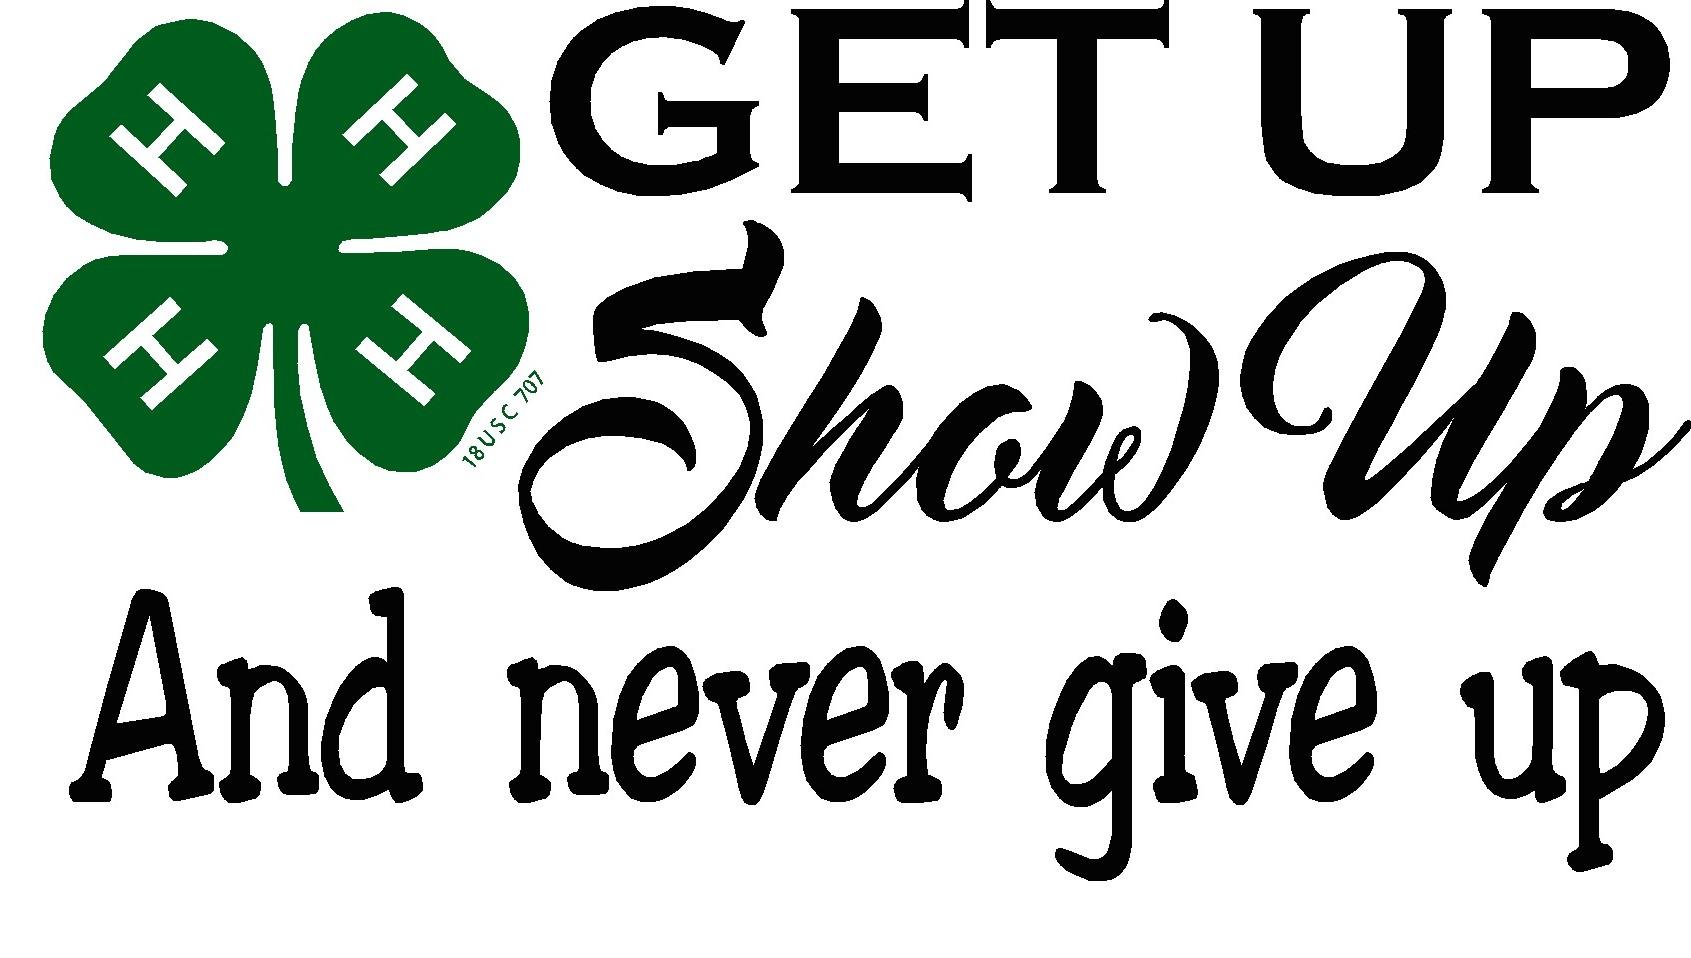 Get_Up-Show_Up